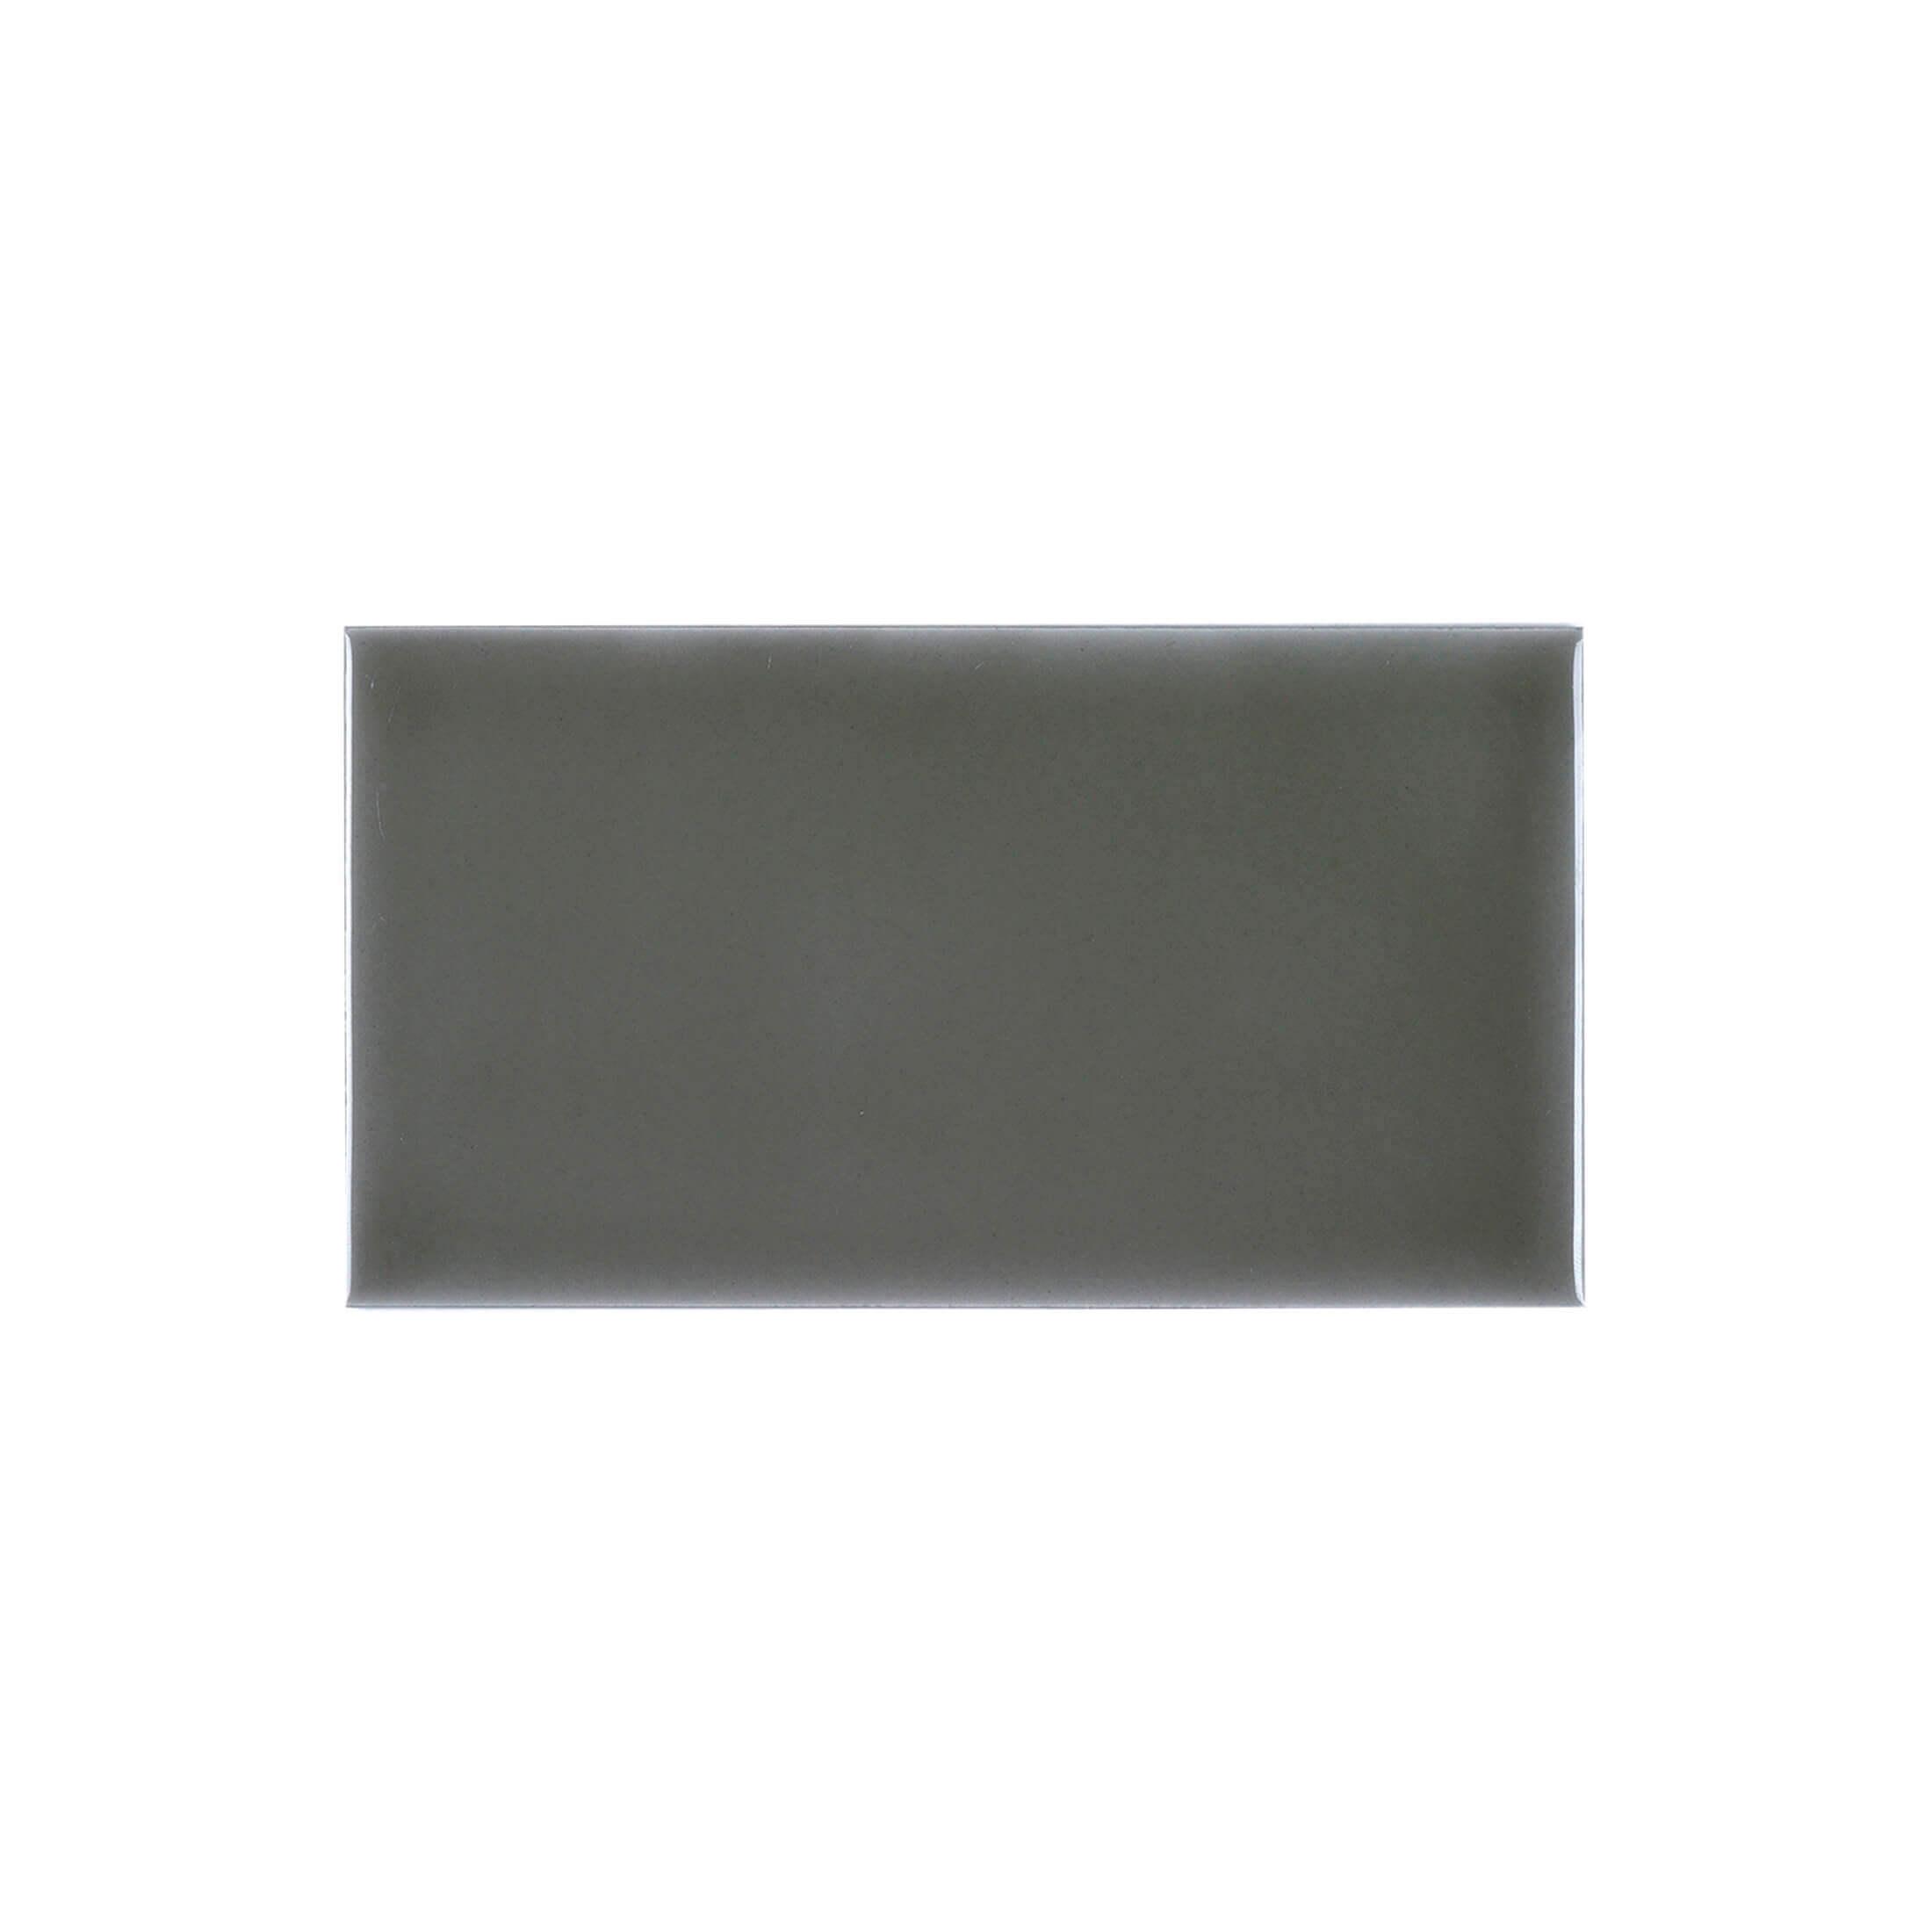 ADST1022 - LISO  - 9.8 cm X 19.8 cm